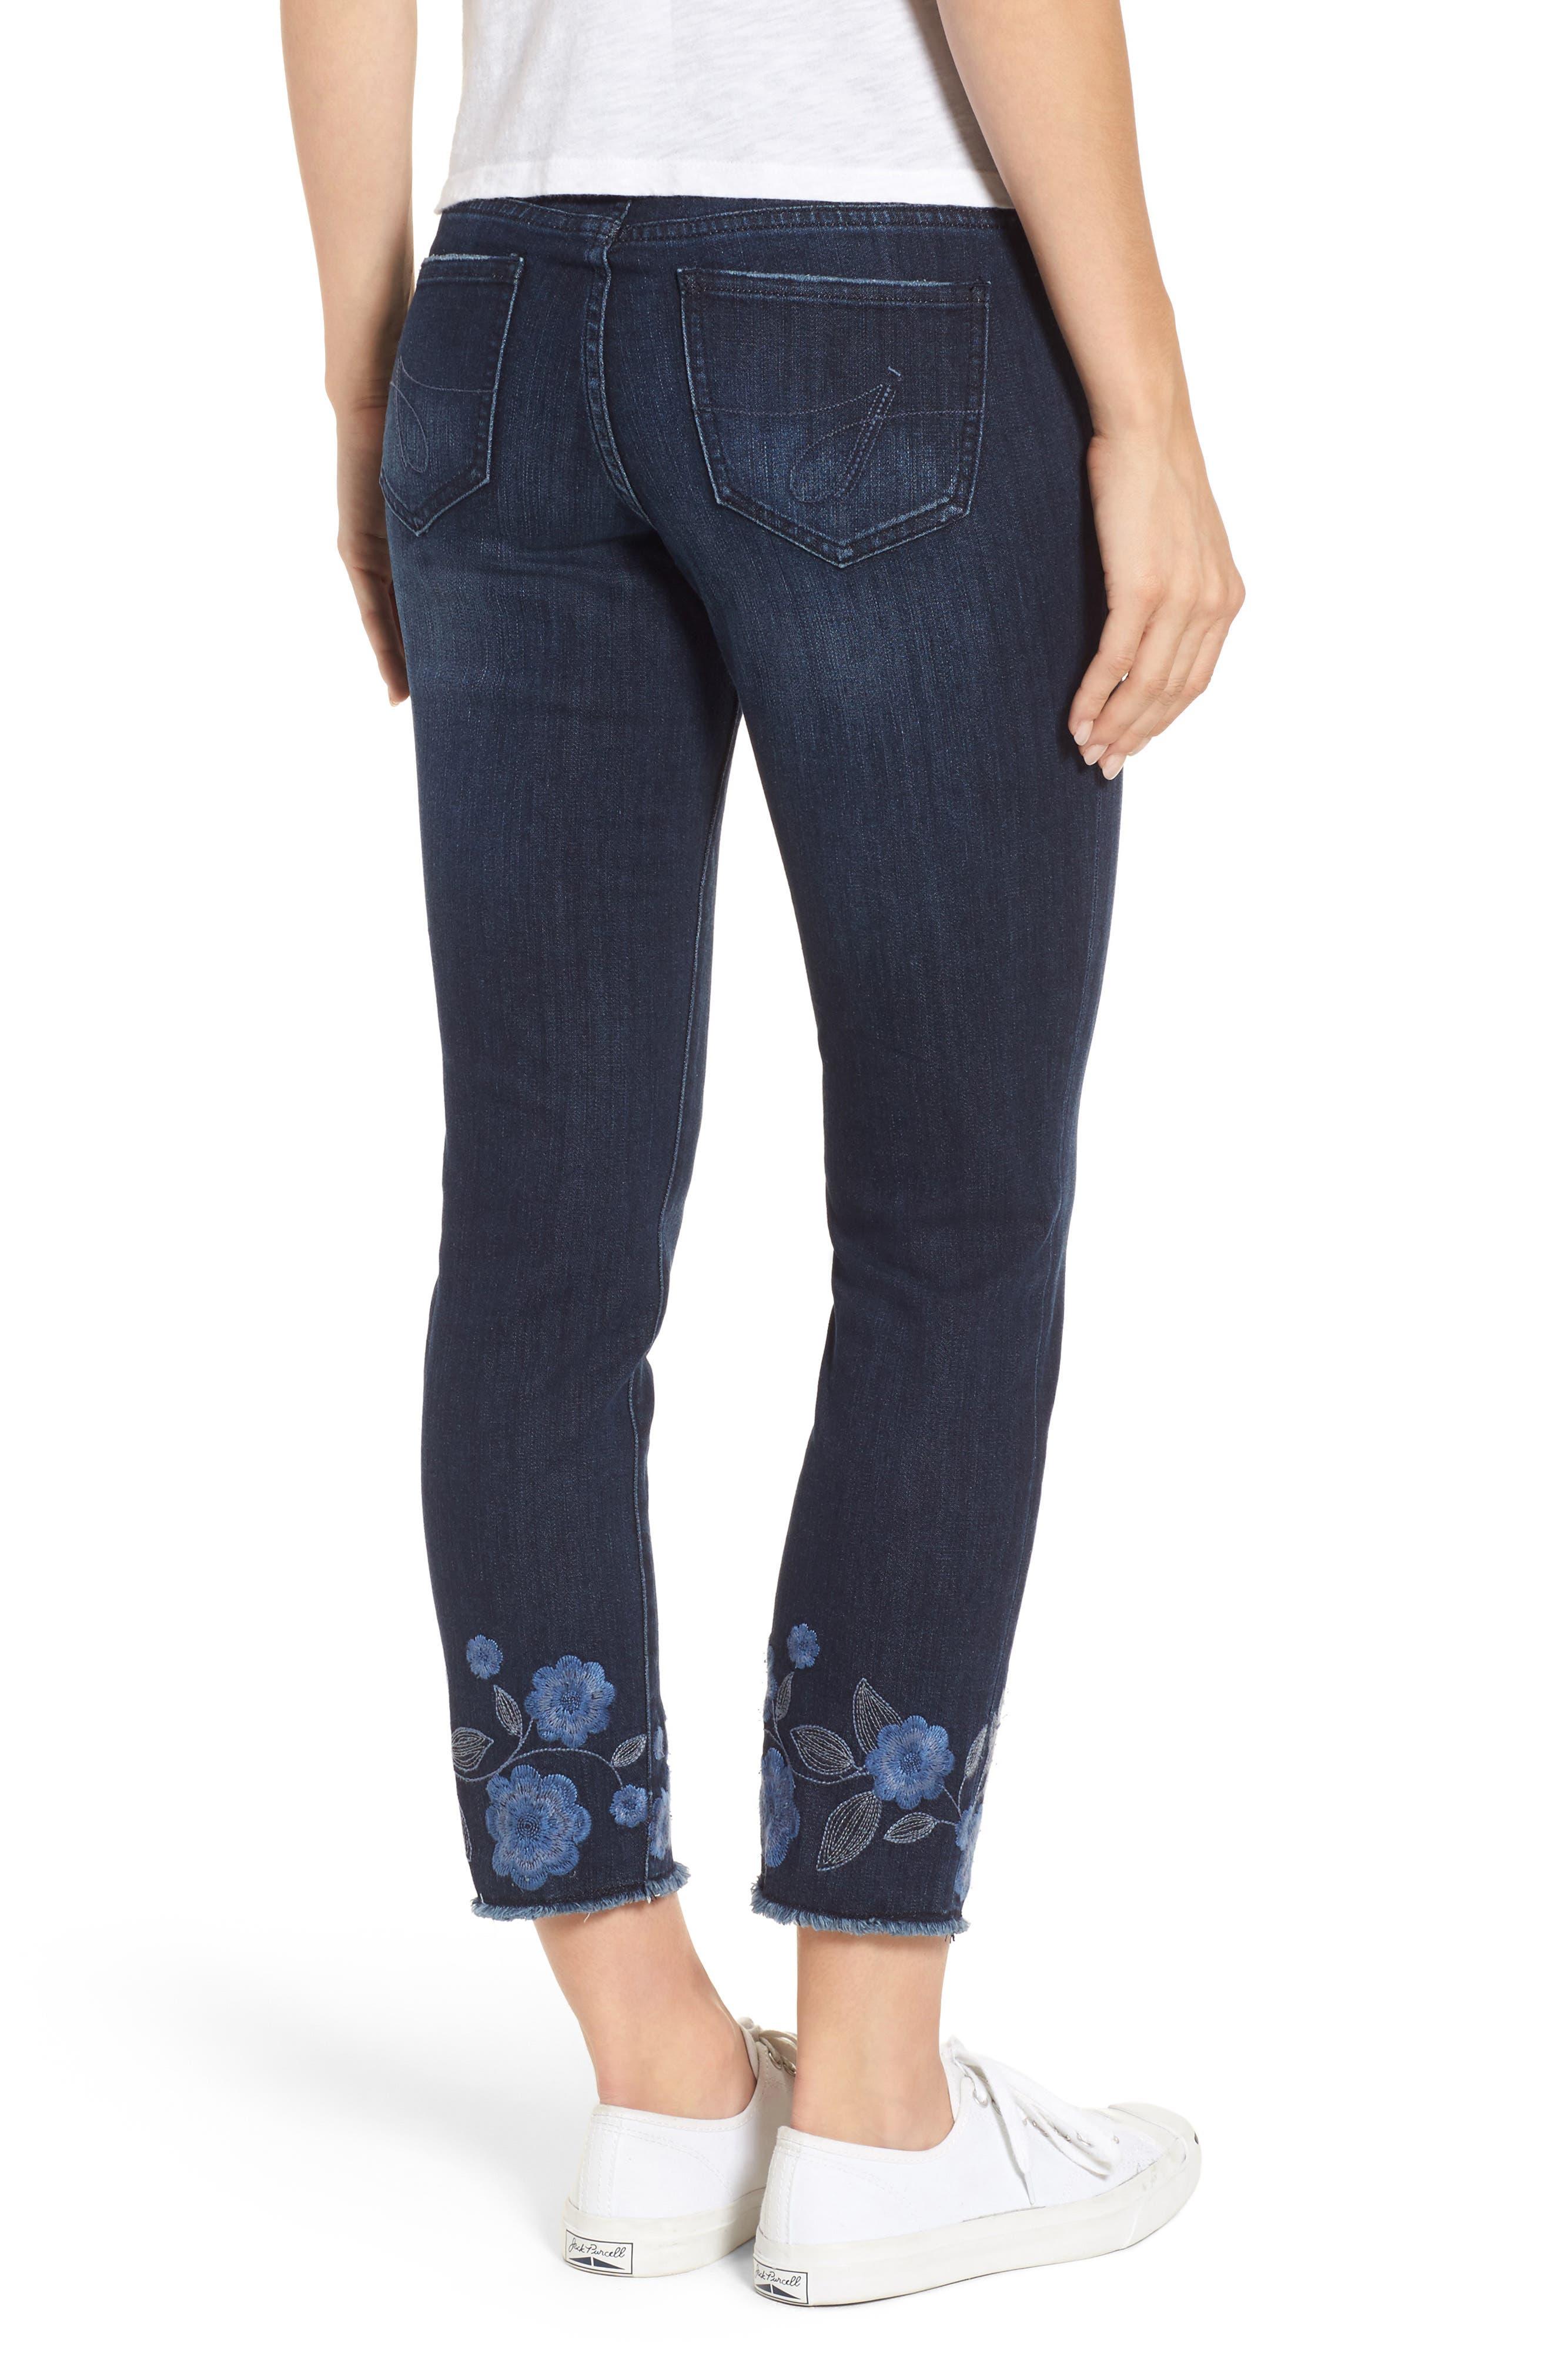 Alternate Image 2  - Jag Jeans Amelia Embroidered Slim Ankle Jeans (Meteor)